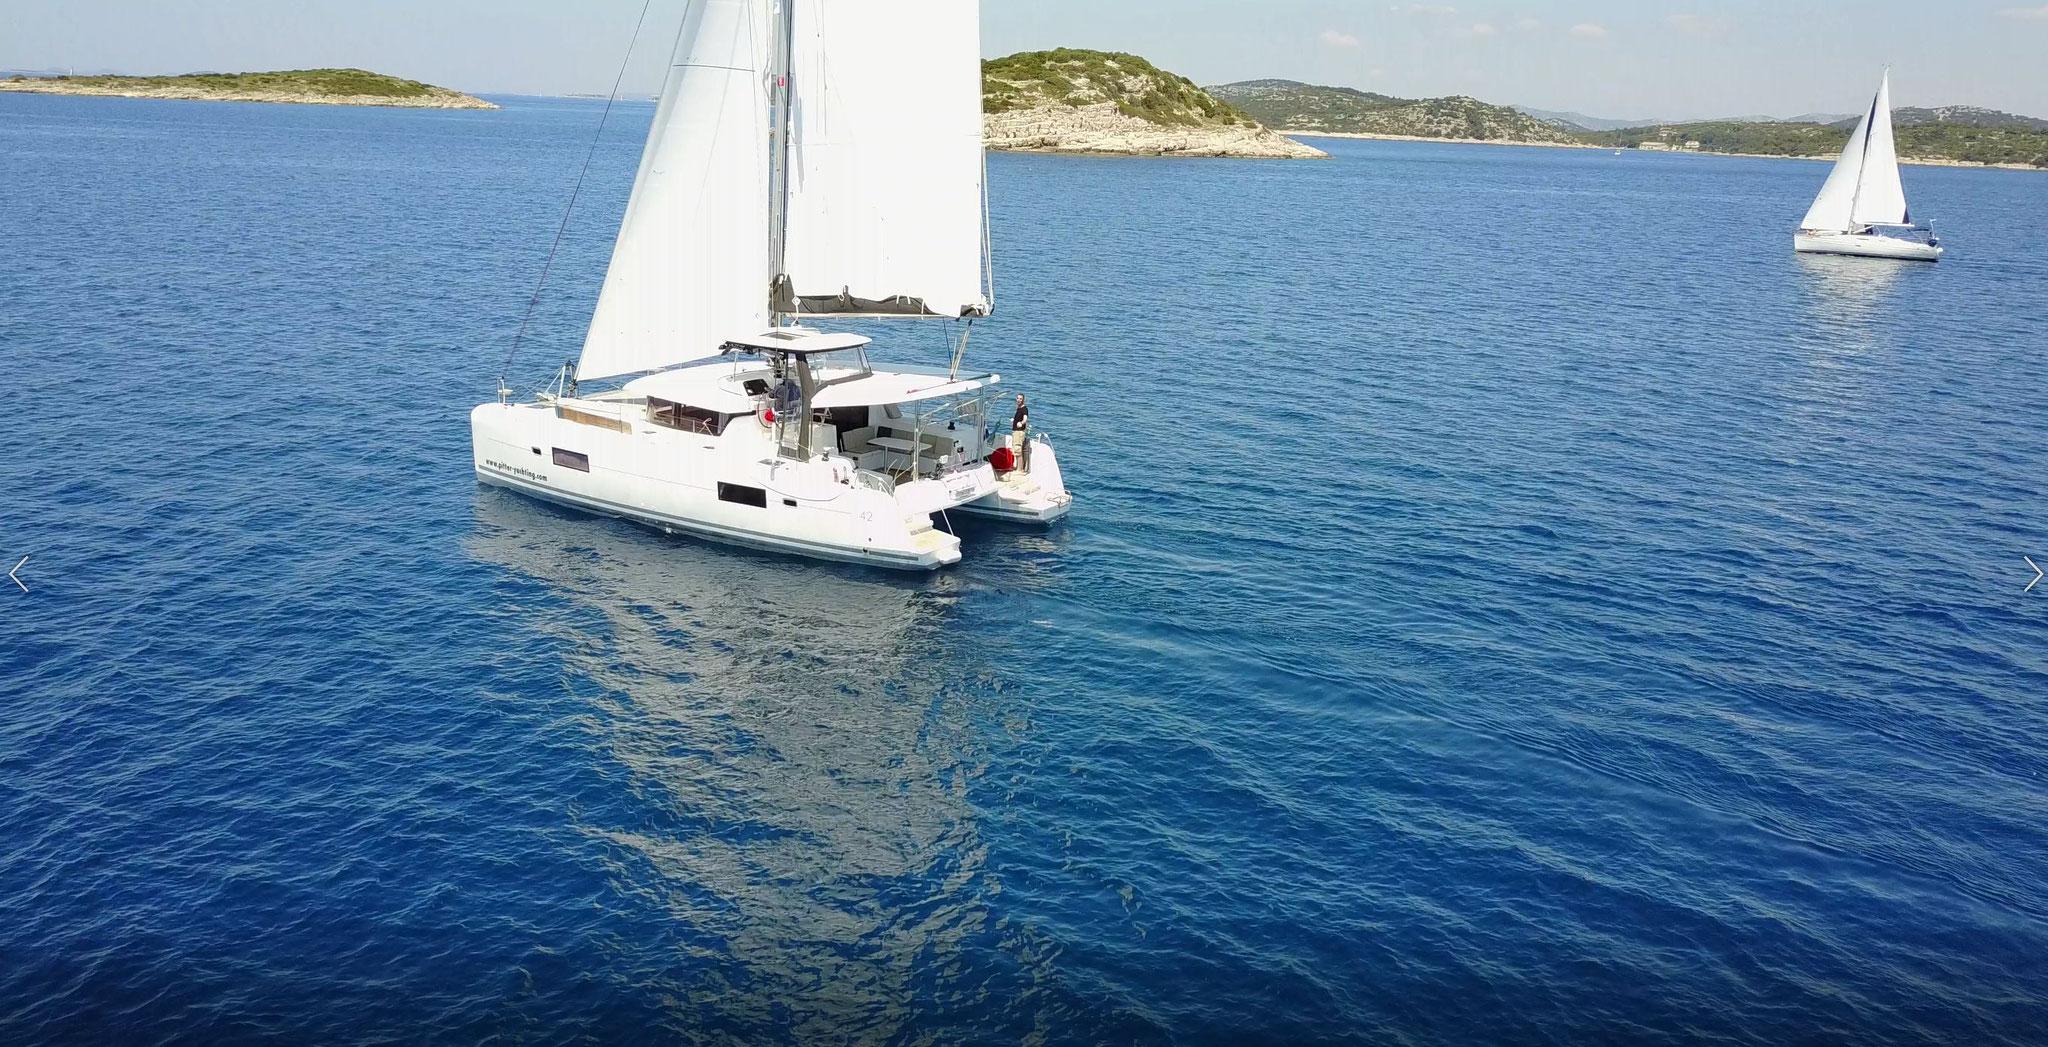 Katamaran segeln als Charter Kroatien von Trogir bei Spllit - www.katamaramtraum.com